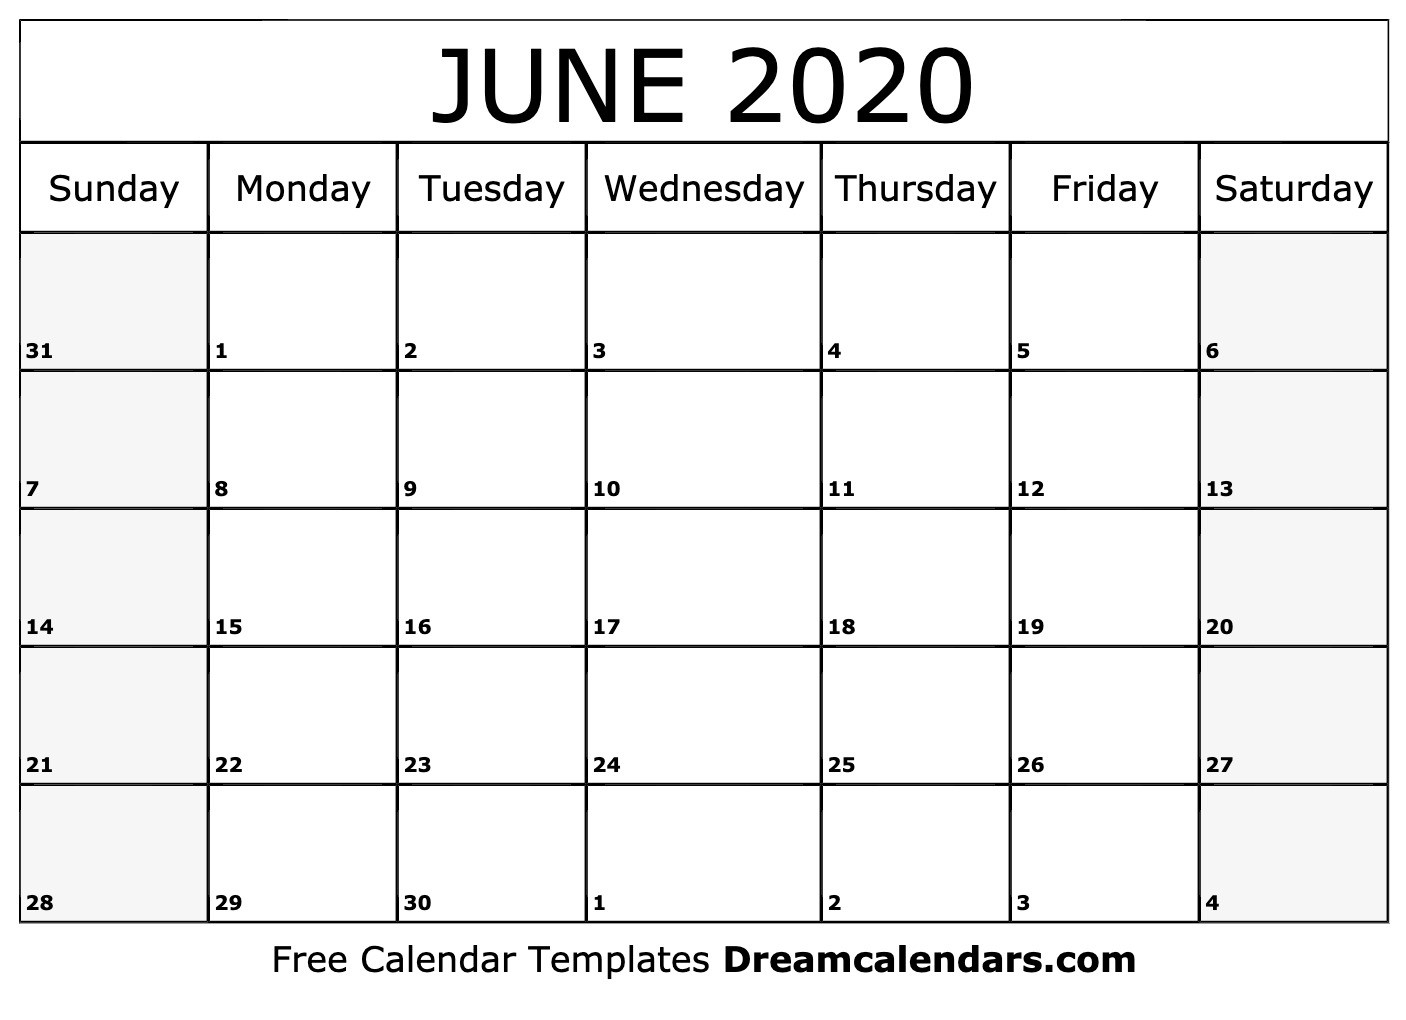 Free Blank June 2020 Printable Calendar-Summer Calendar Blank 2020